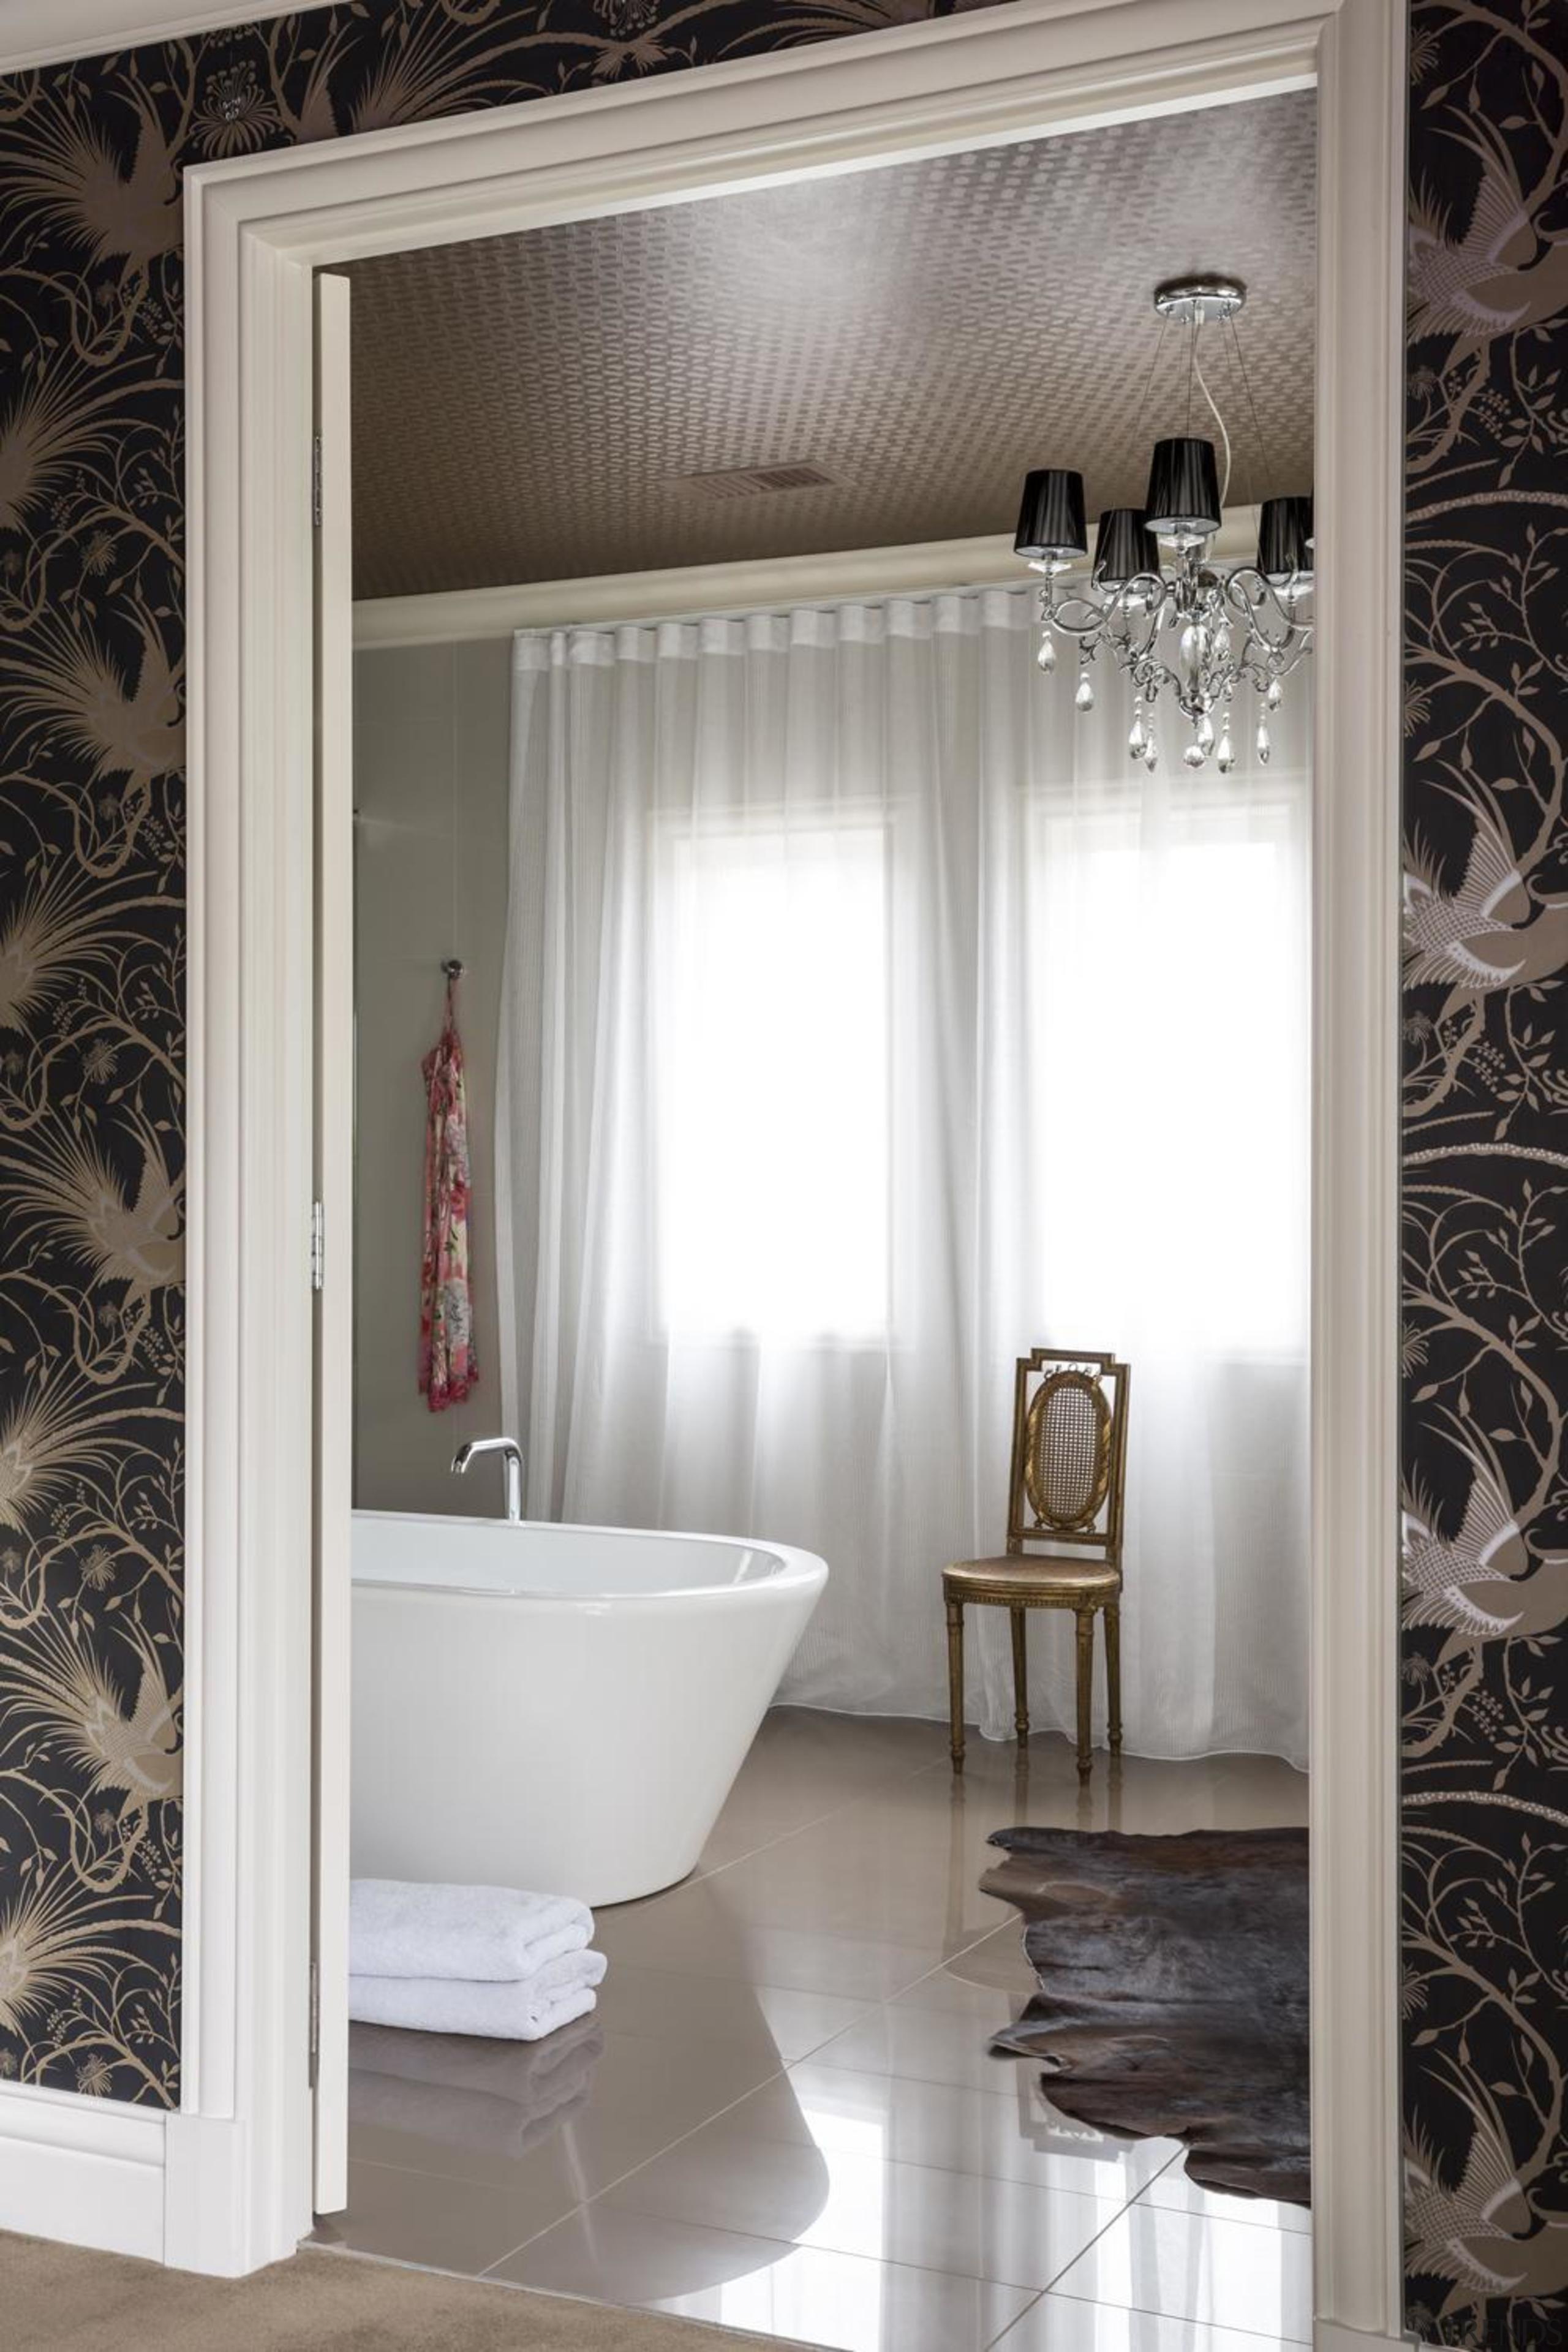 Master Bedroom - bathroom | ceiling | curtain bathroom, ceiling, curtain, floor, flooring, home, interior design, room, wall, window, window treatment, white, gray